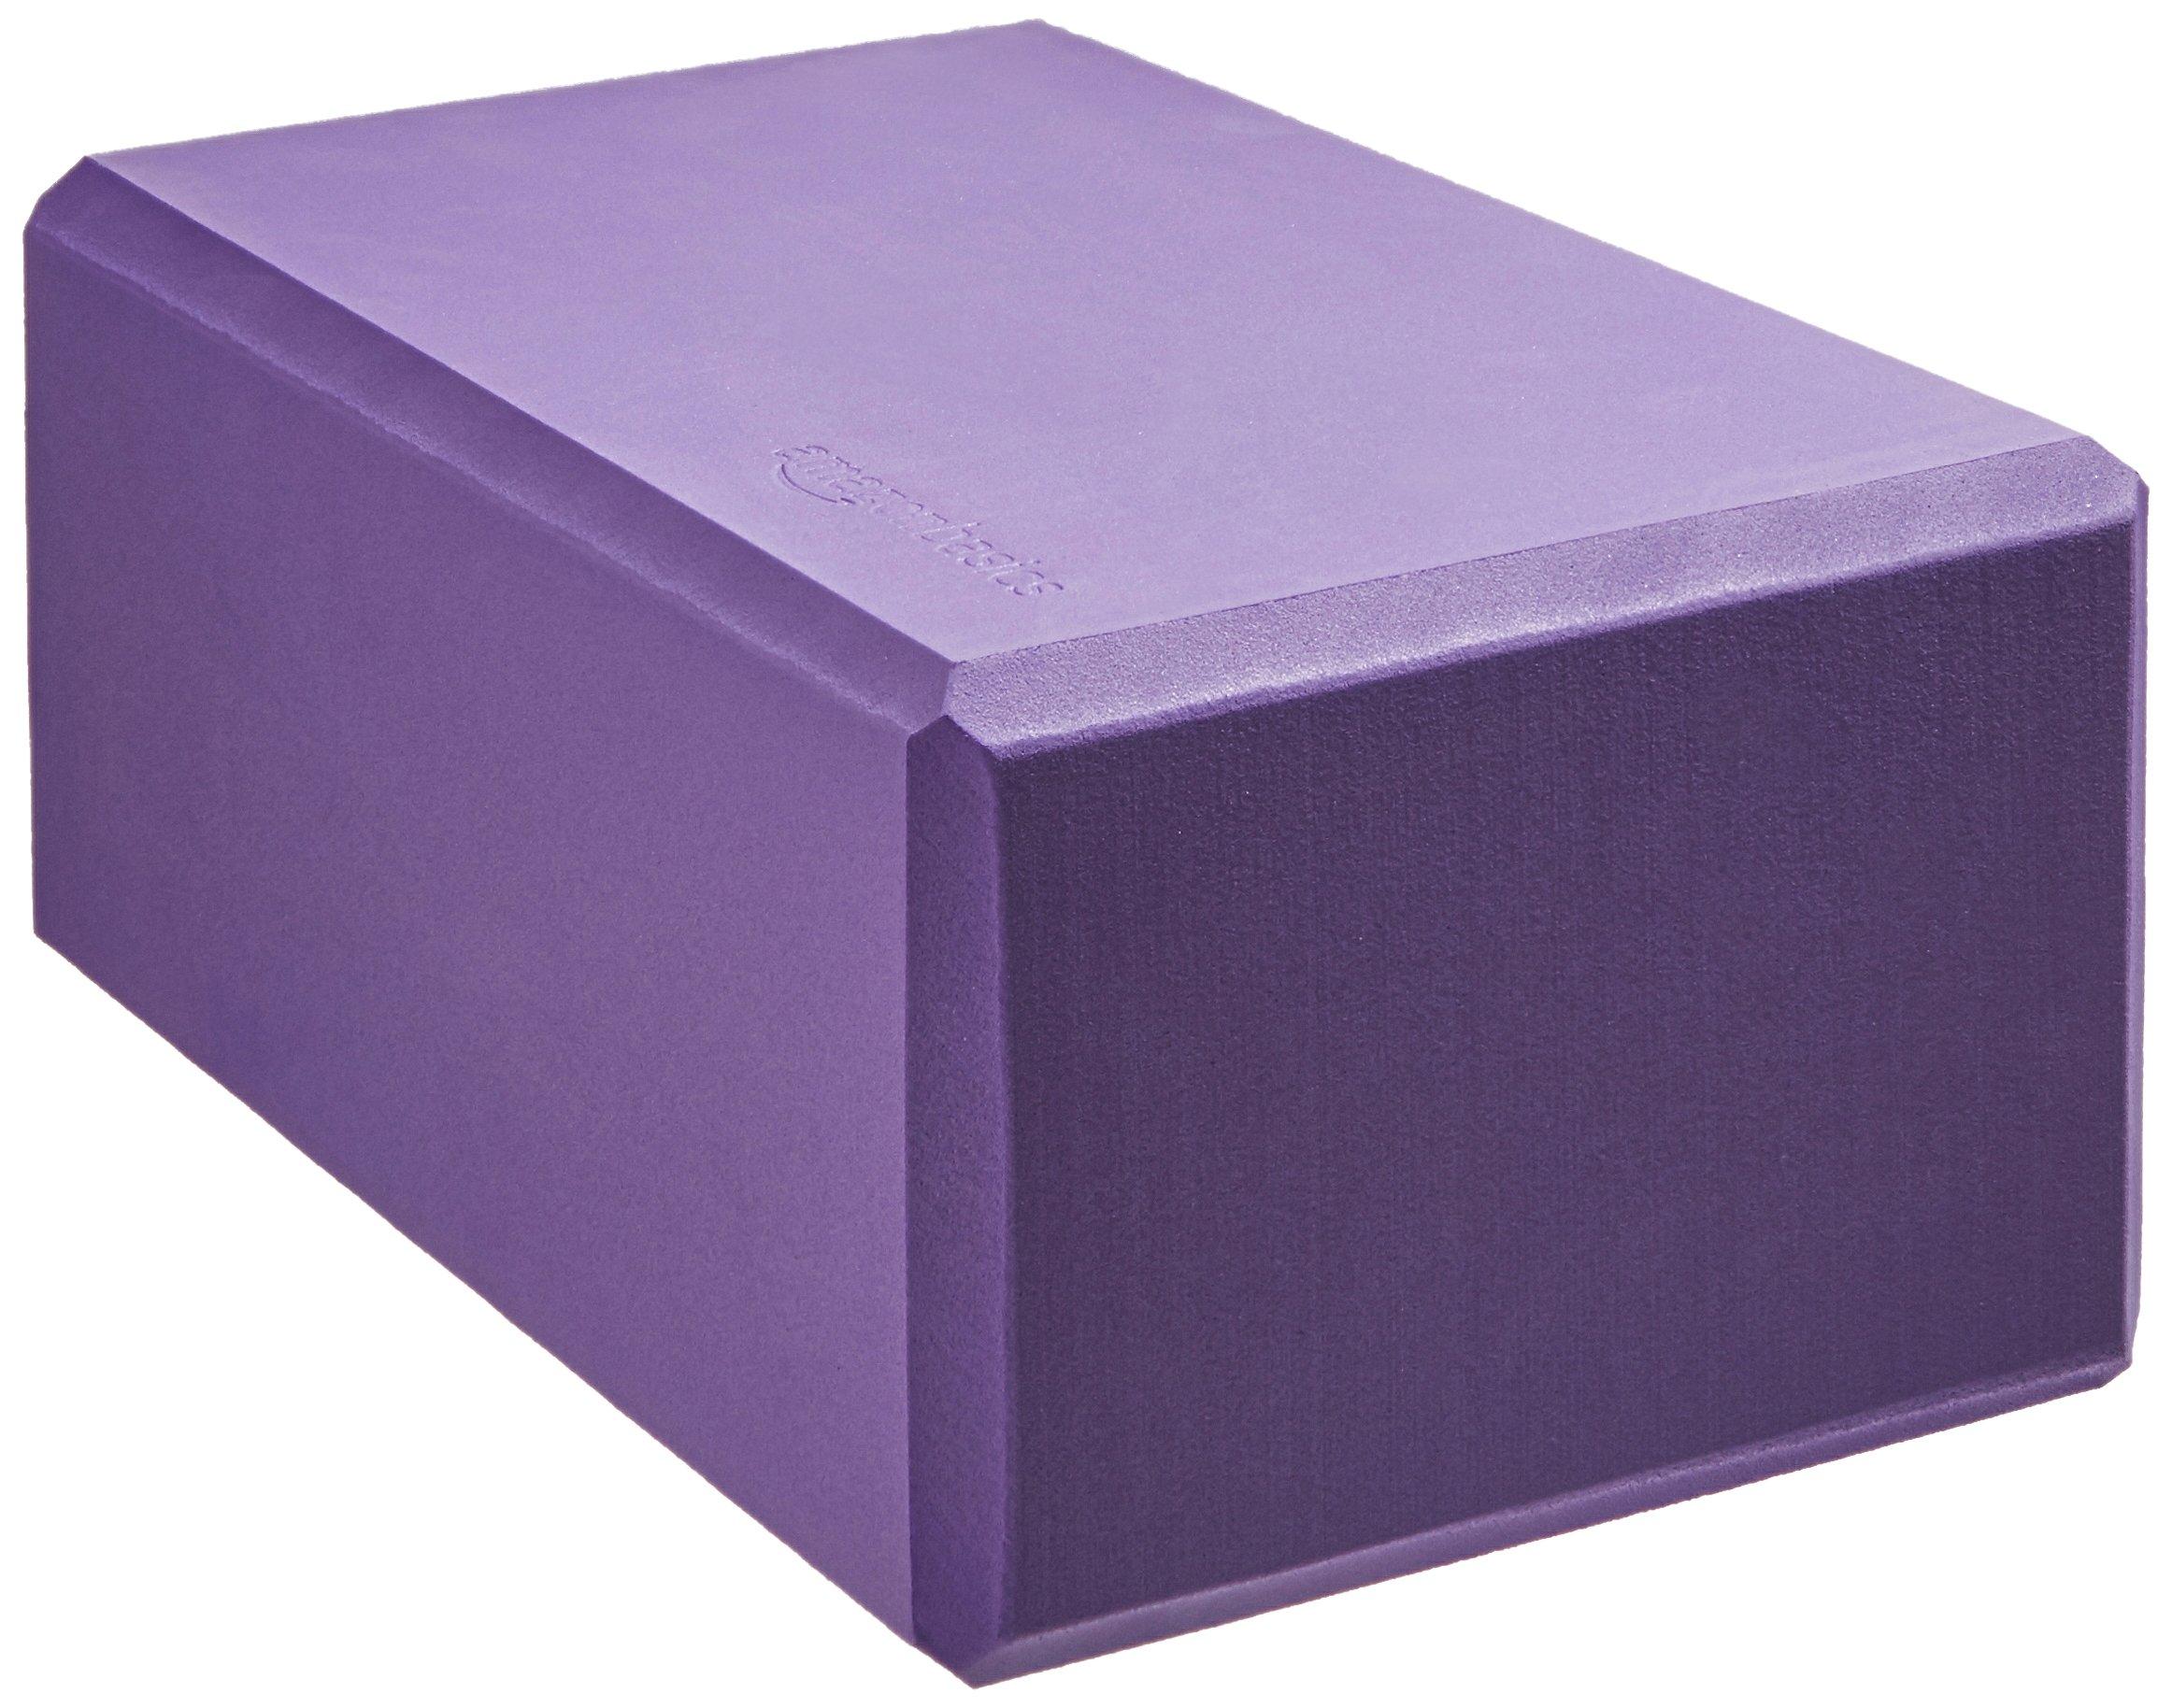 AmazonBasics Foam Yoga Blocks - 4 x 9 x 6 Inches, Set of 2, Purple by AmazonBasics (Image #4)